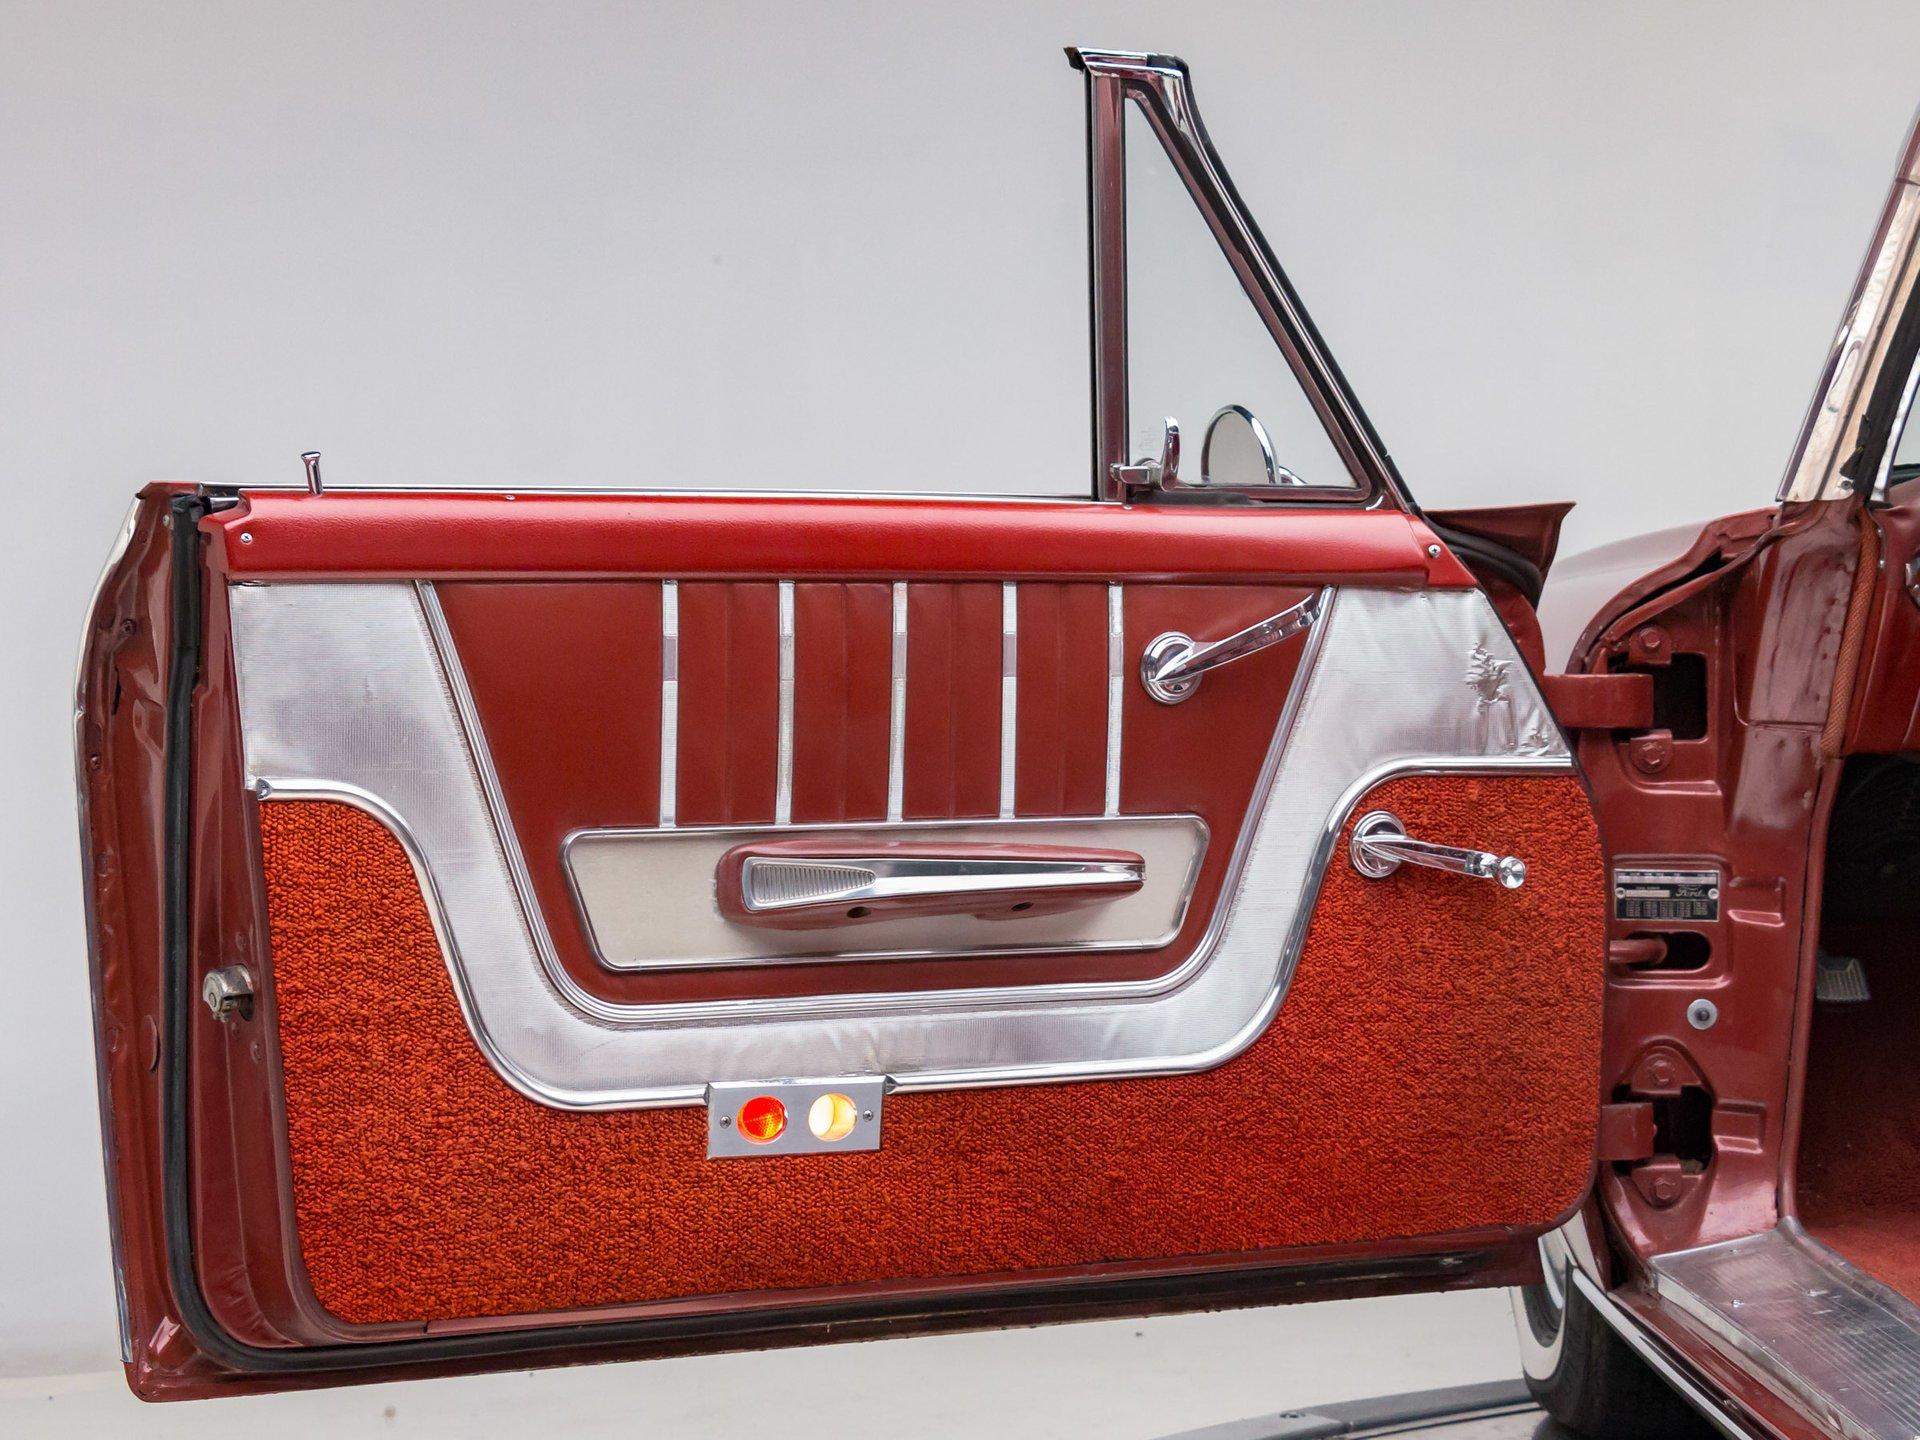 1962 Ford Galaxie Duffy S Classic Cars